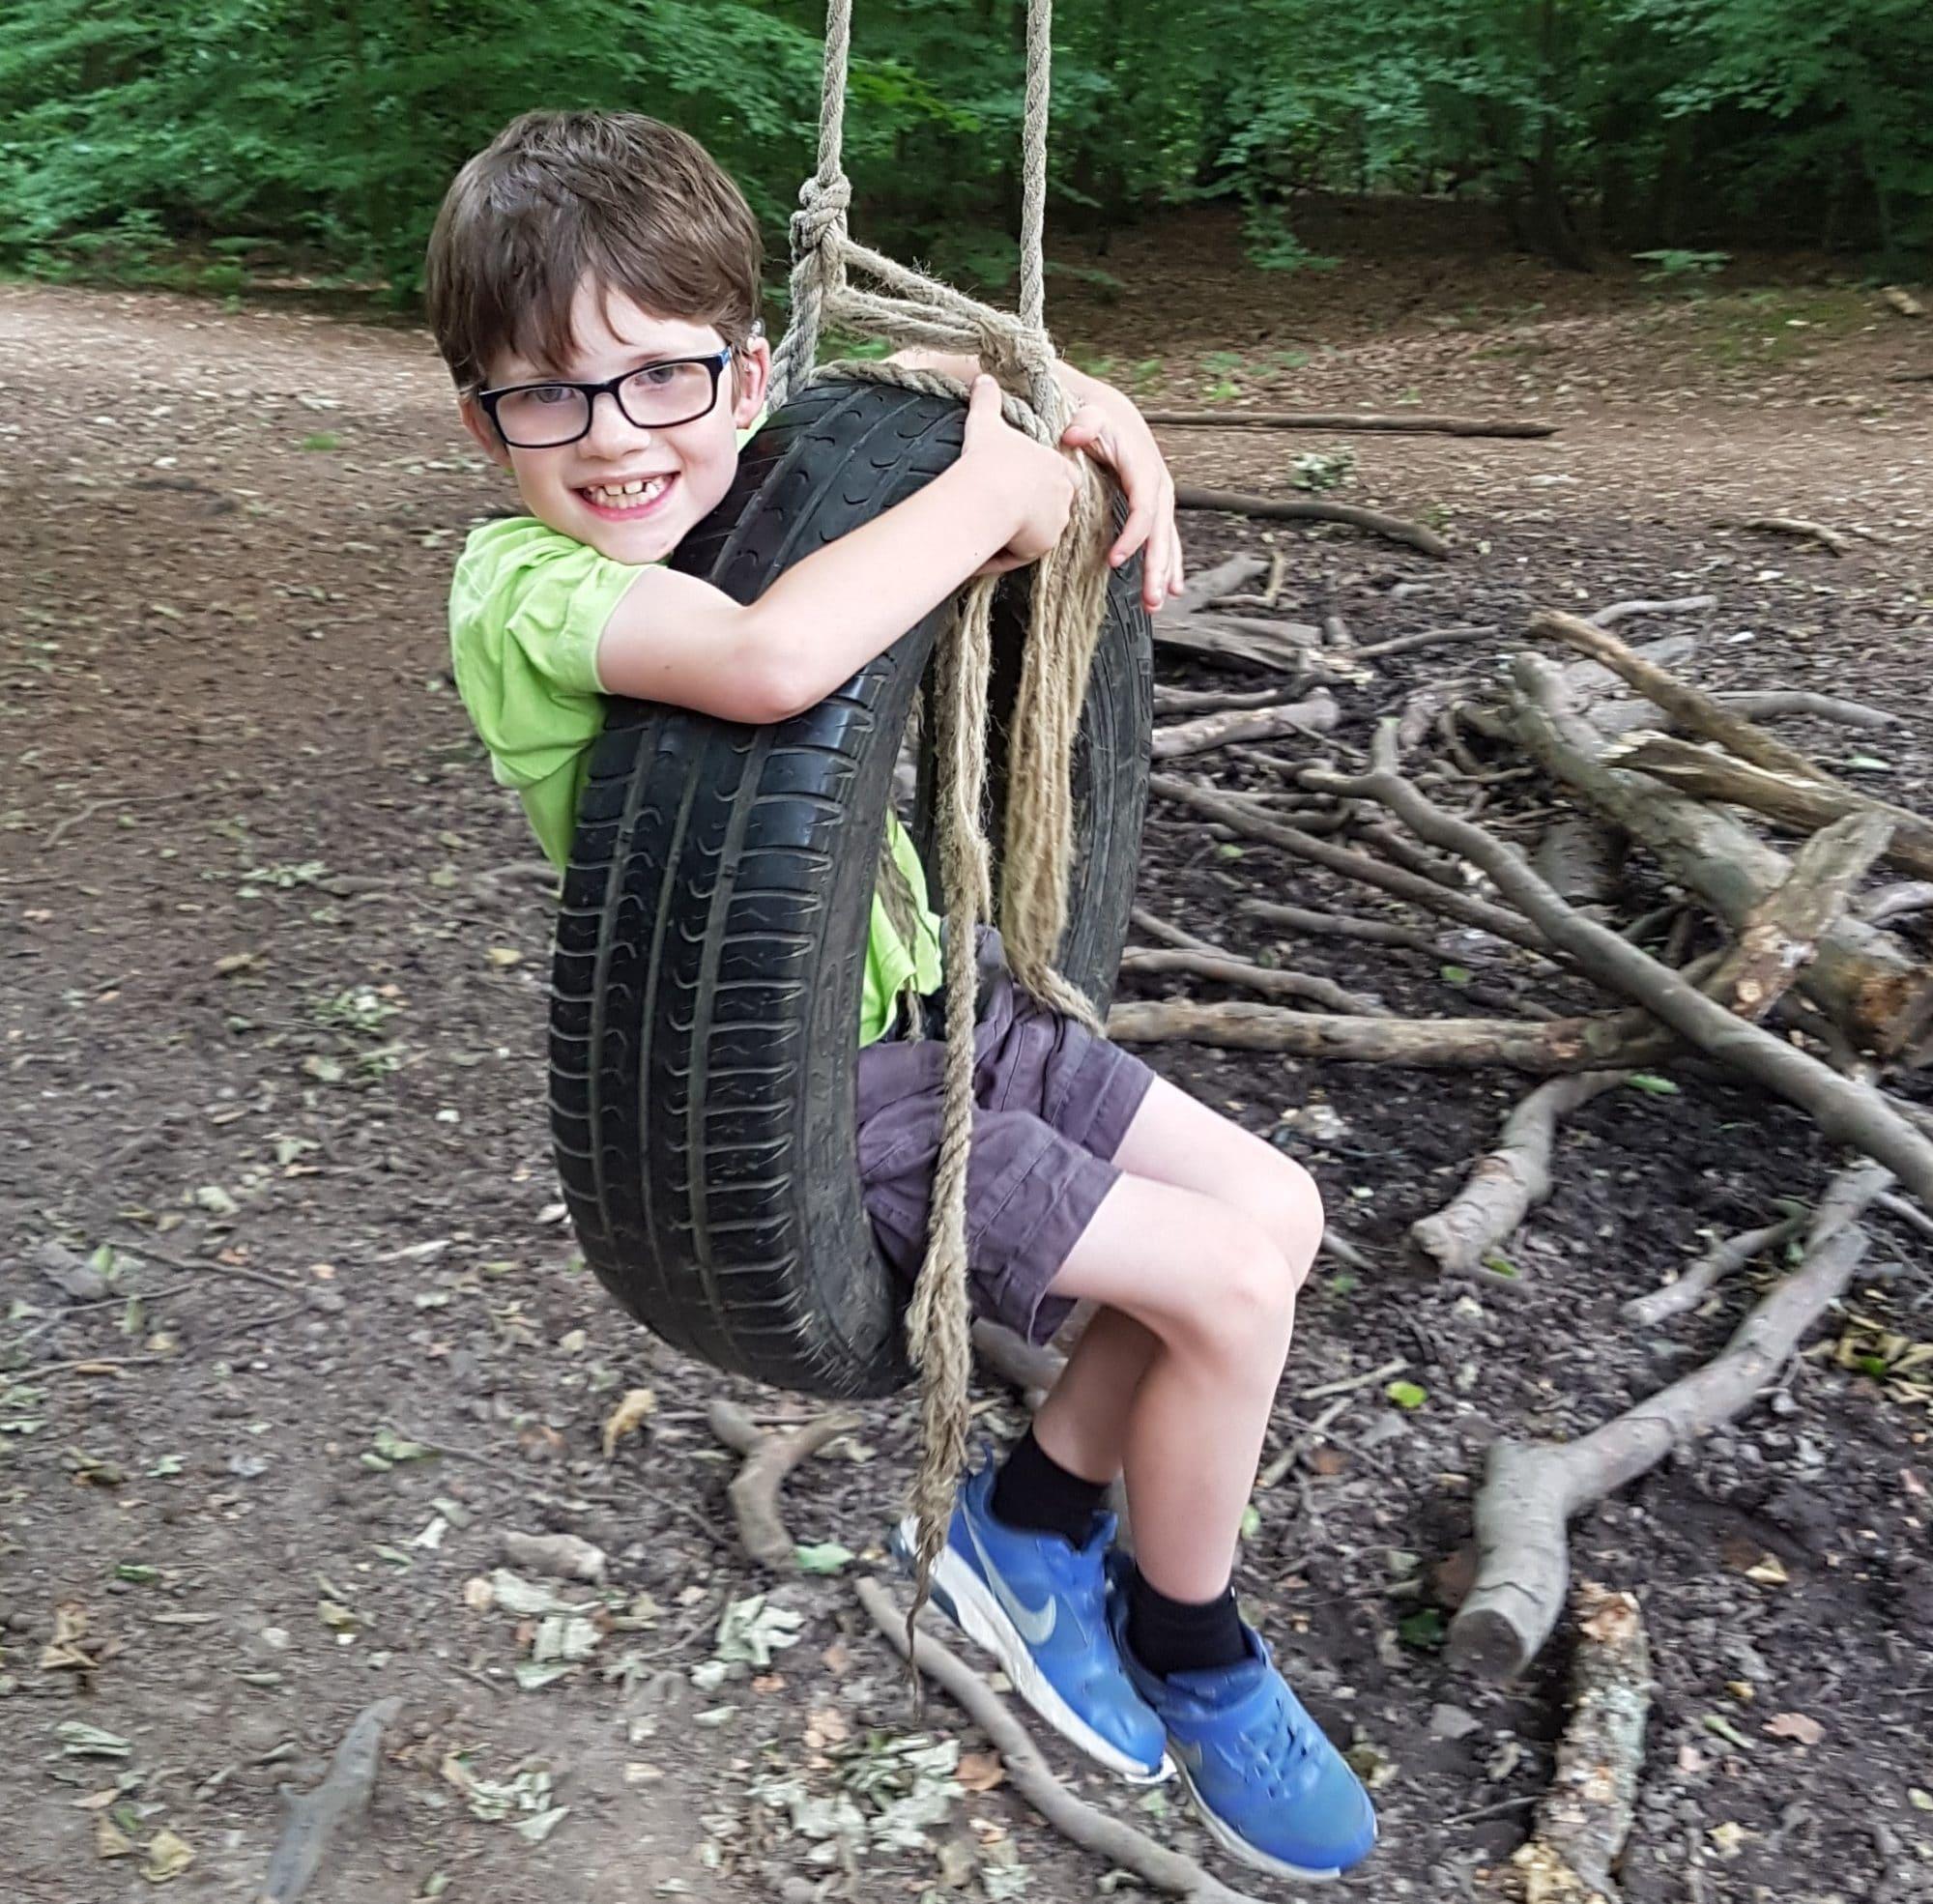 Boy smiling on rope swing